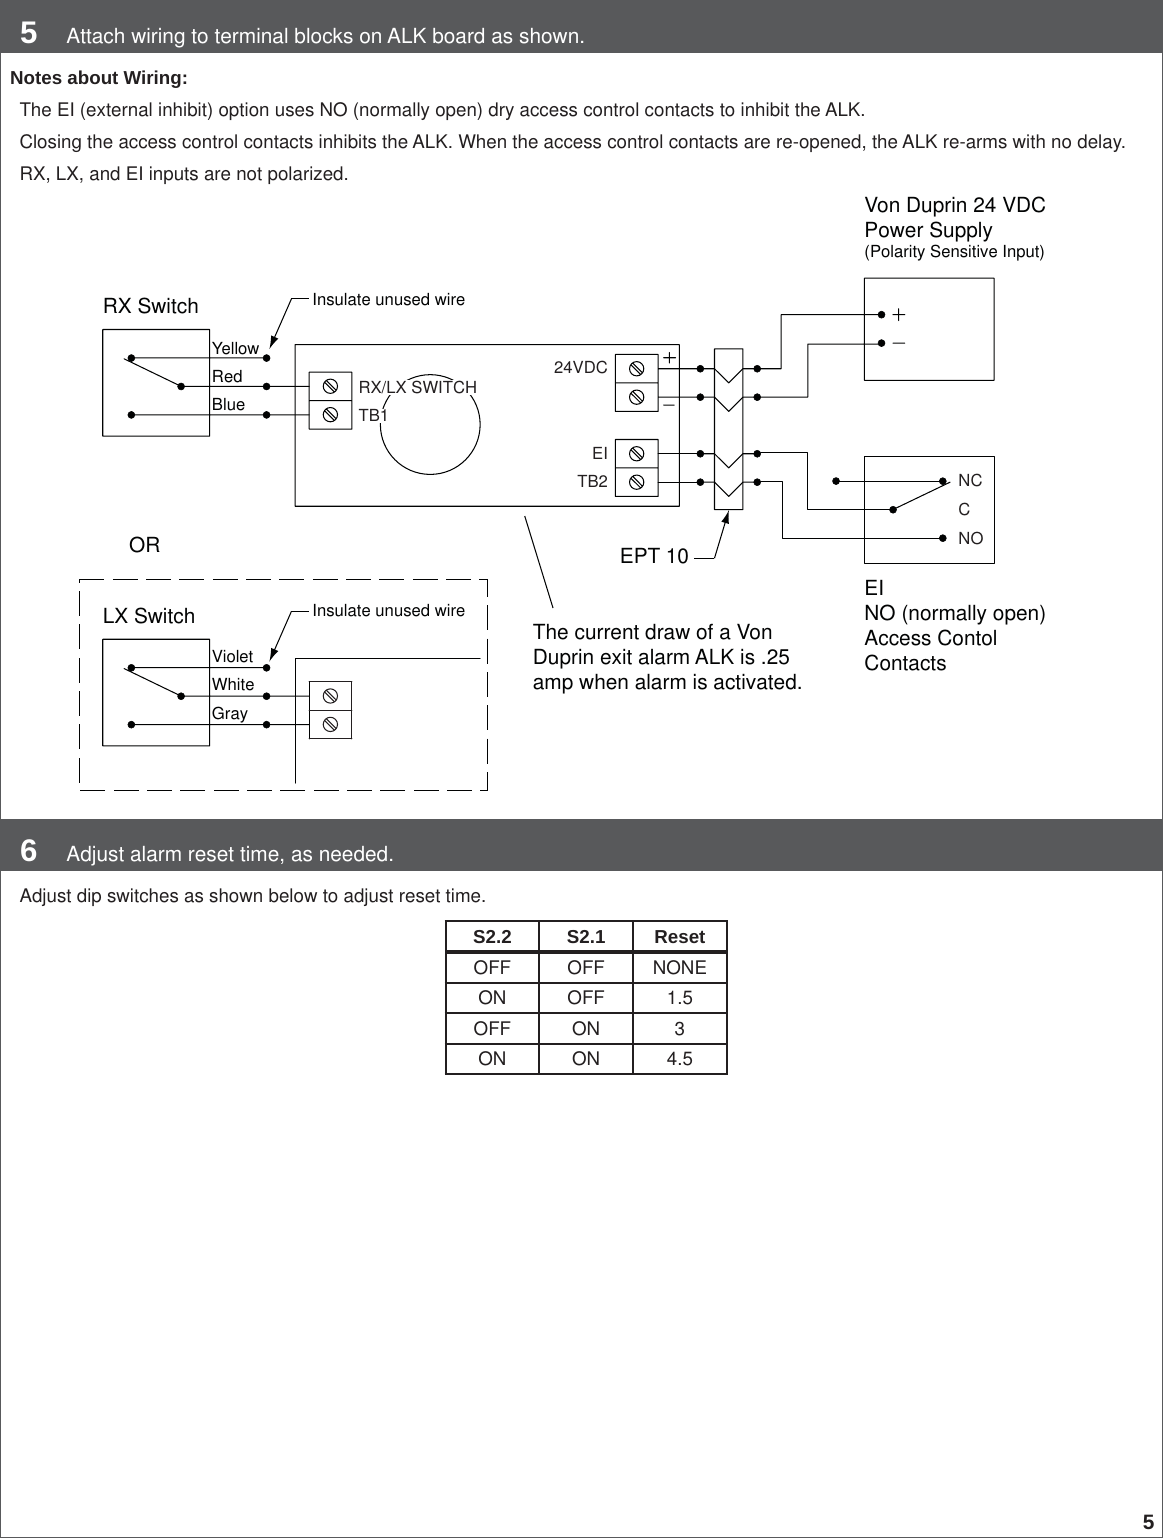 ps914 wiring diagram internet of things diagrams wiring